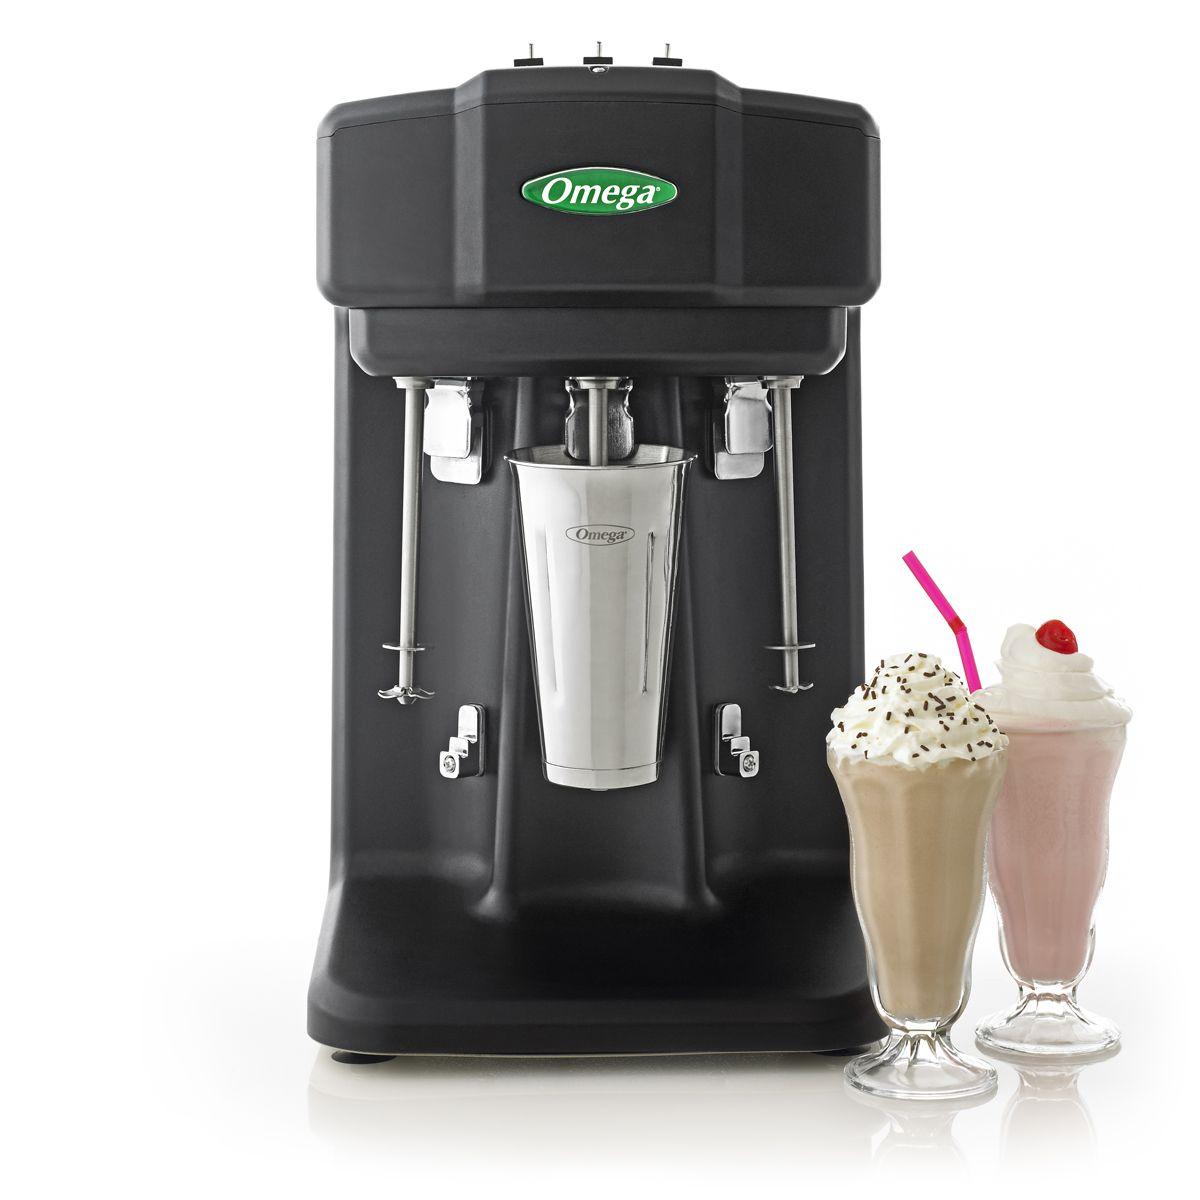 omega milkshake machine